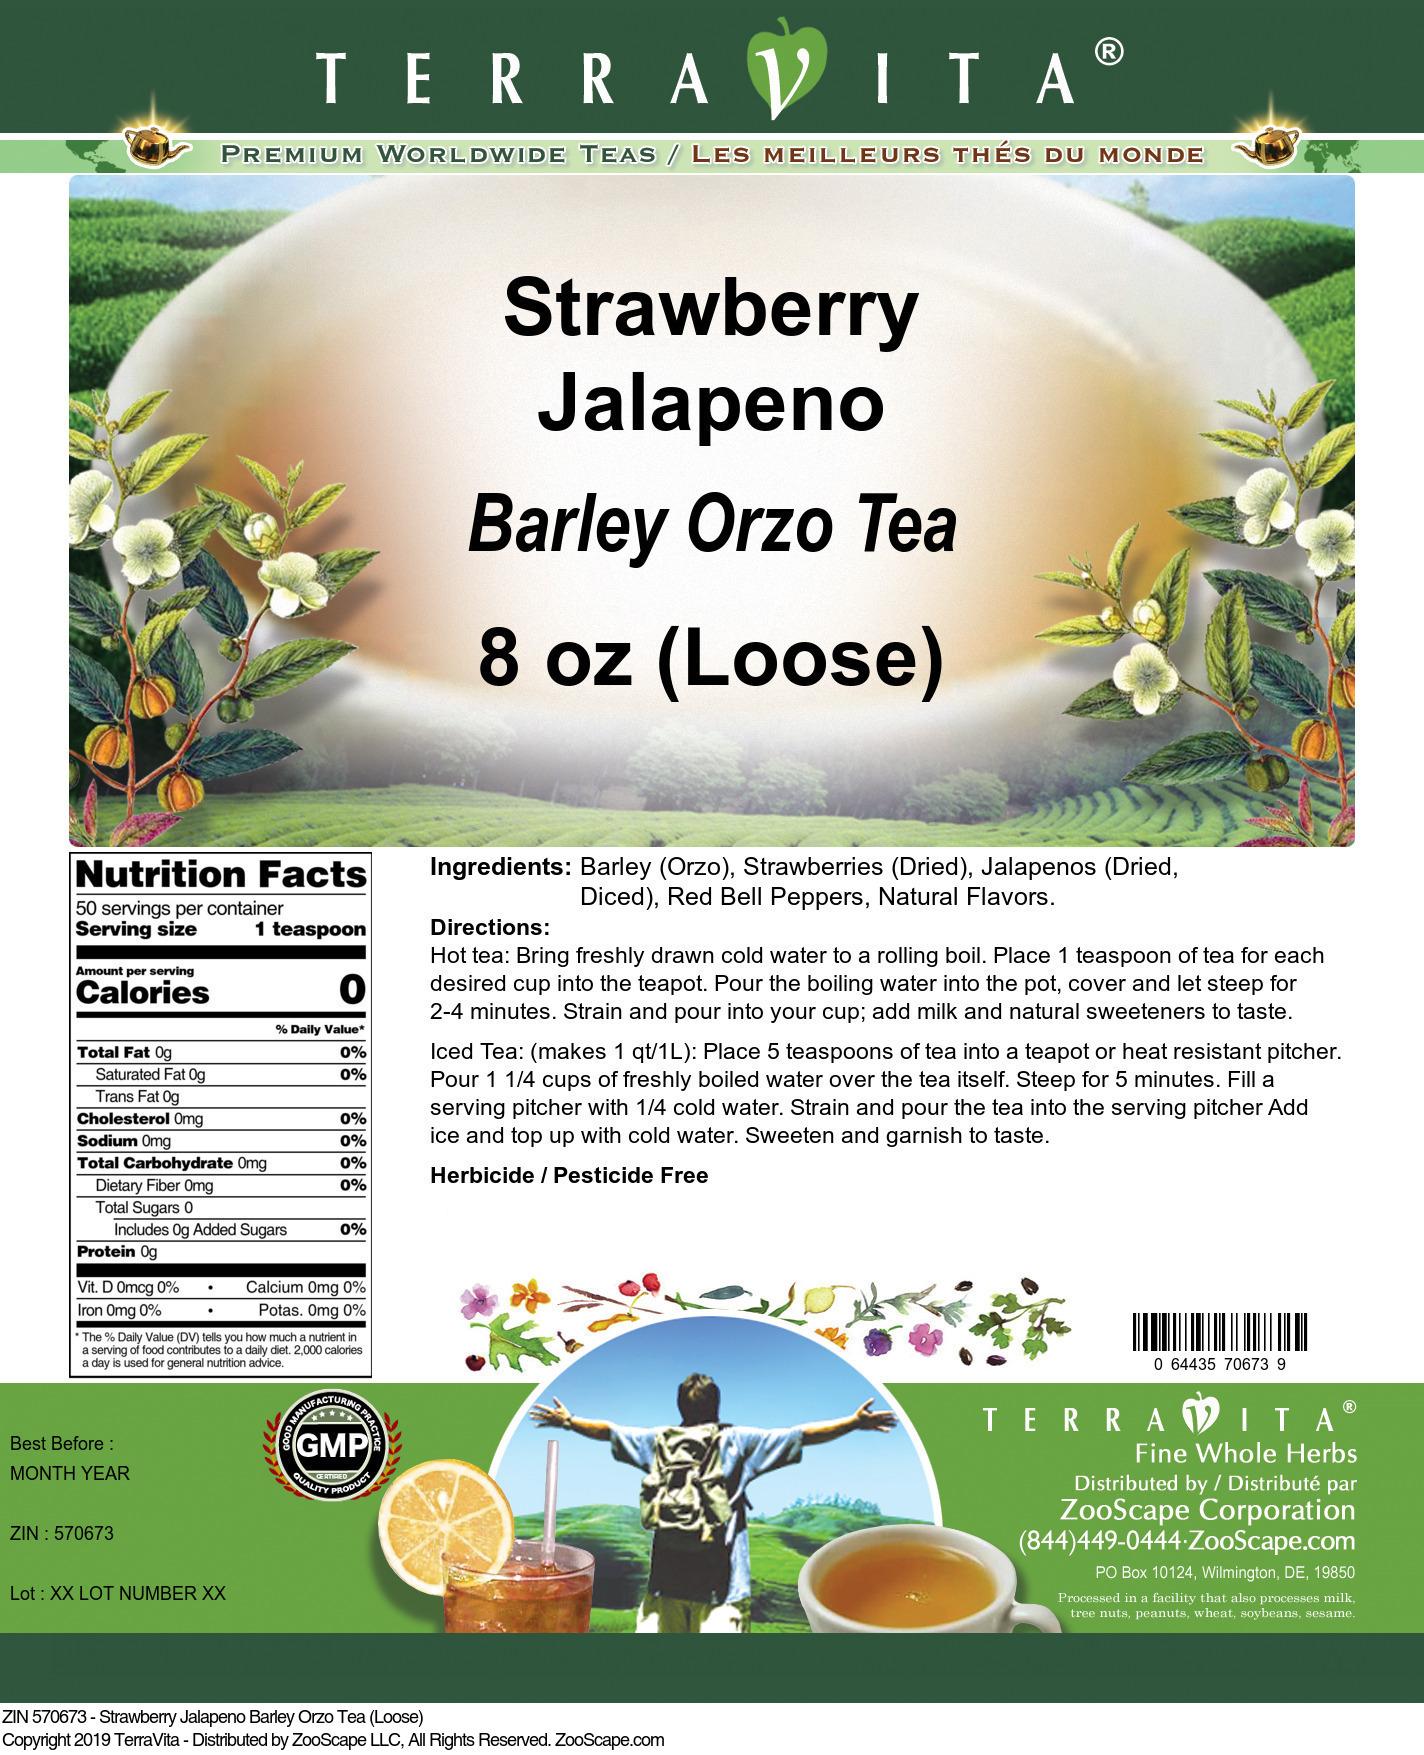 Strawberry Jalapeno Barley Orzo